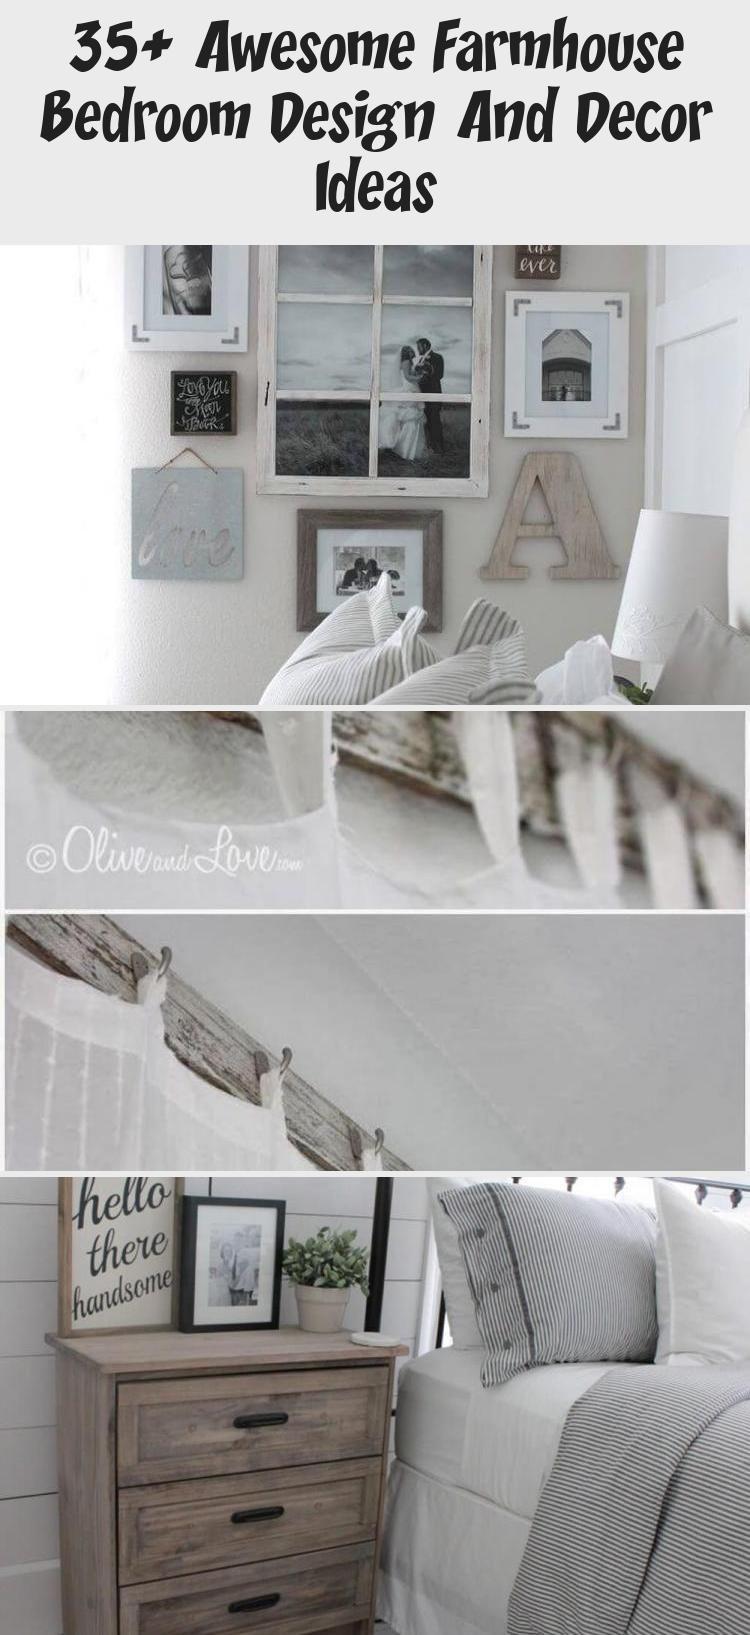 35+ Awesome Farmhouse Bedroom Design And Decor Ideas